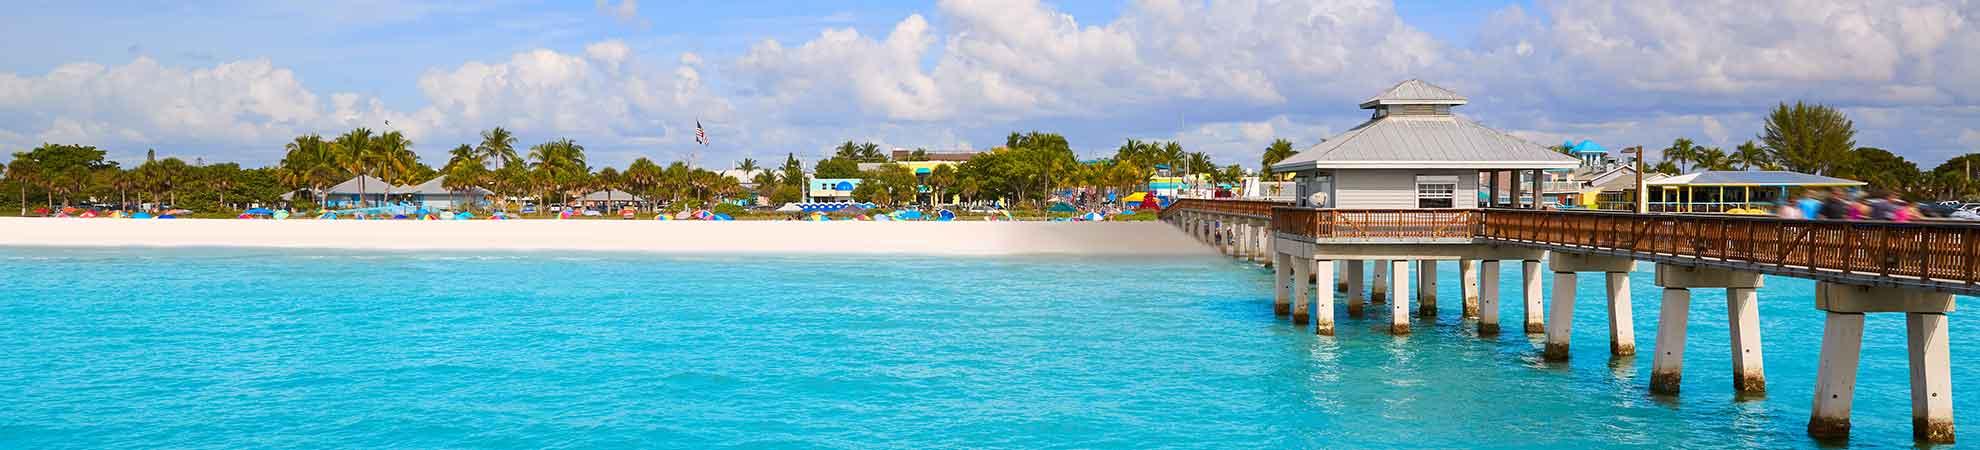 Voyage Floride en Février